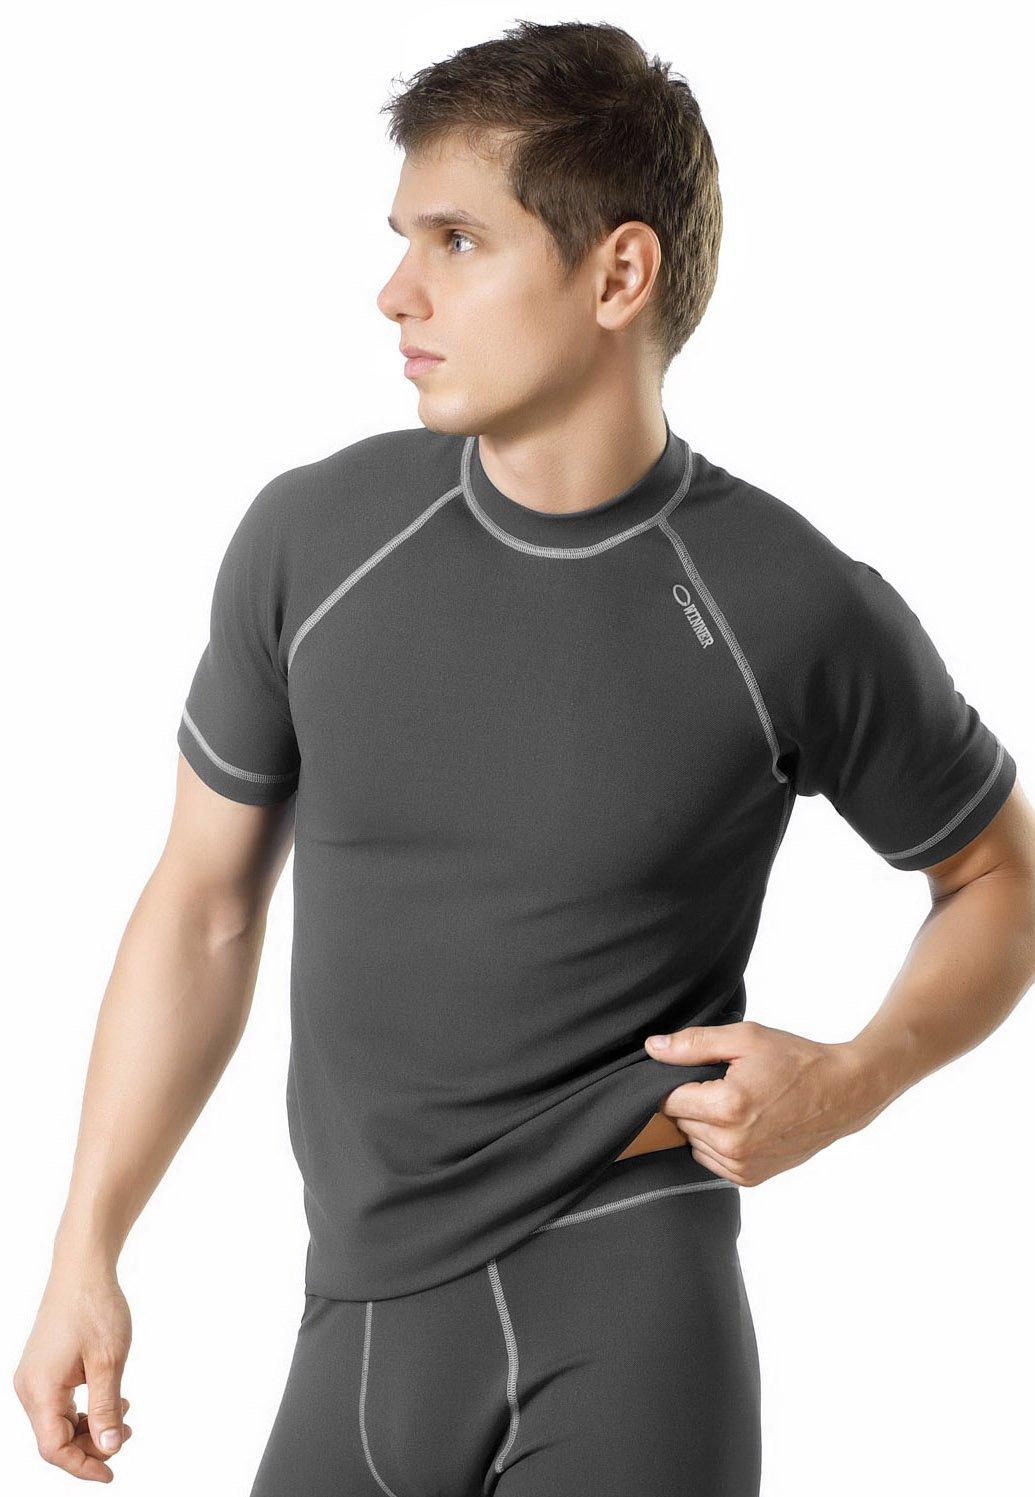 gWINNER ® Herren Funktionsunterwäsche - Kurzarm Shirt – SILVERPLUS® CLASSIC V - SOFT Line